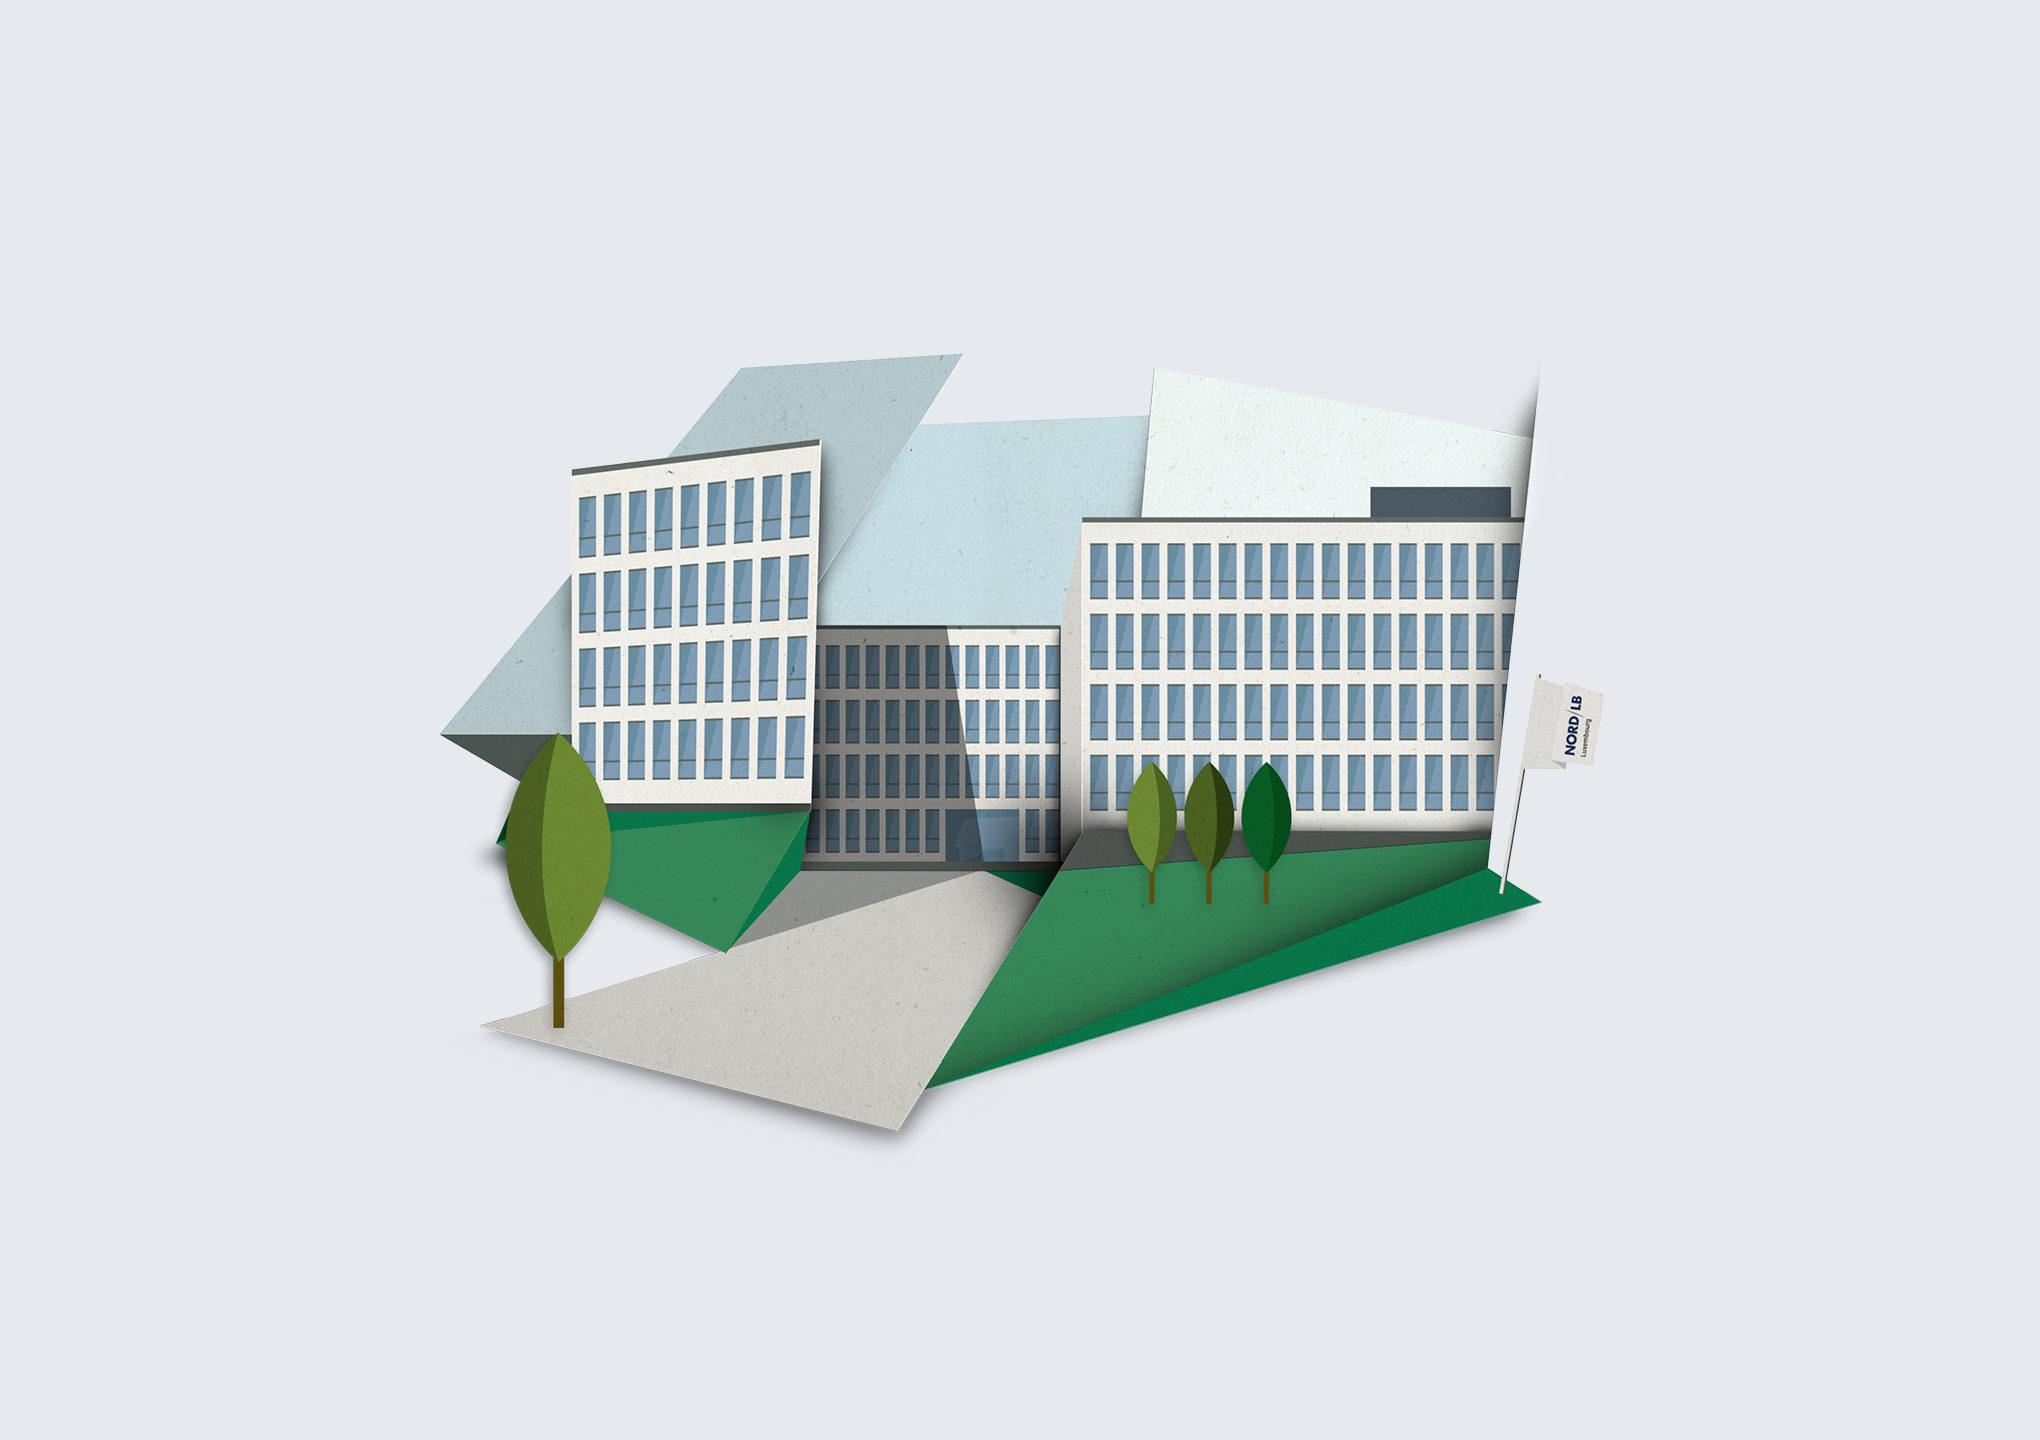 Illustration des Firmengebäudes der NORD/LB Luxemburg